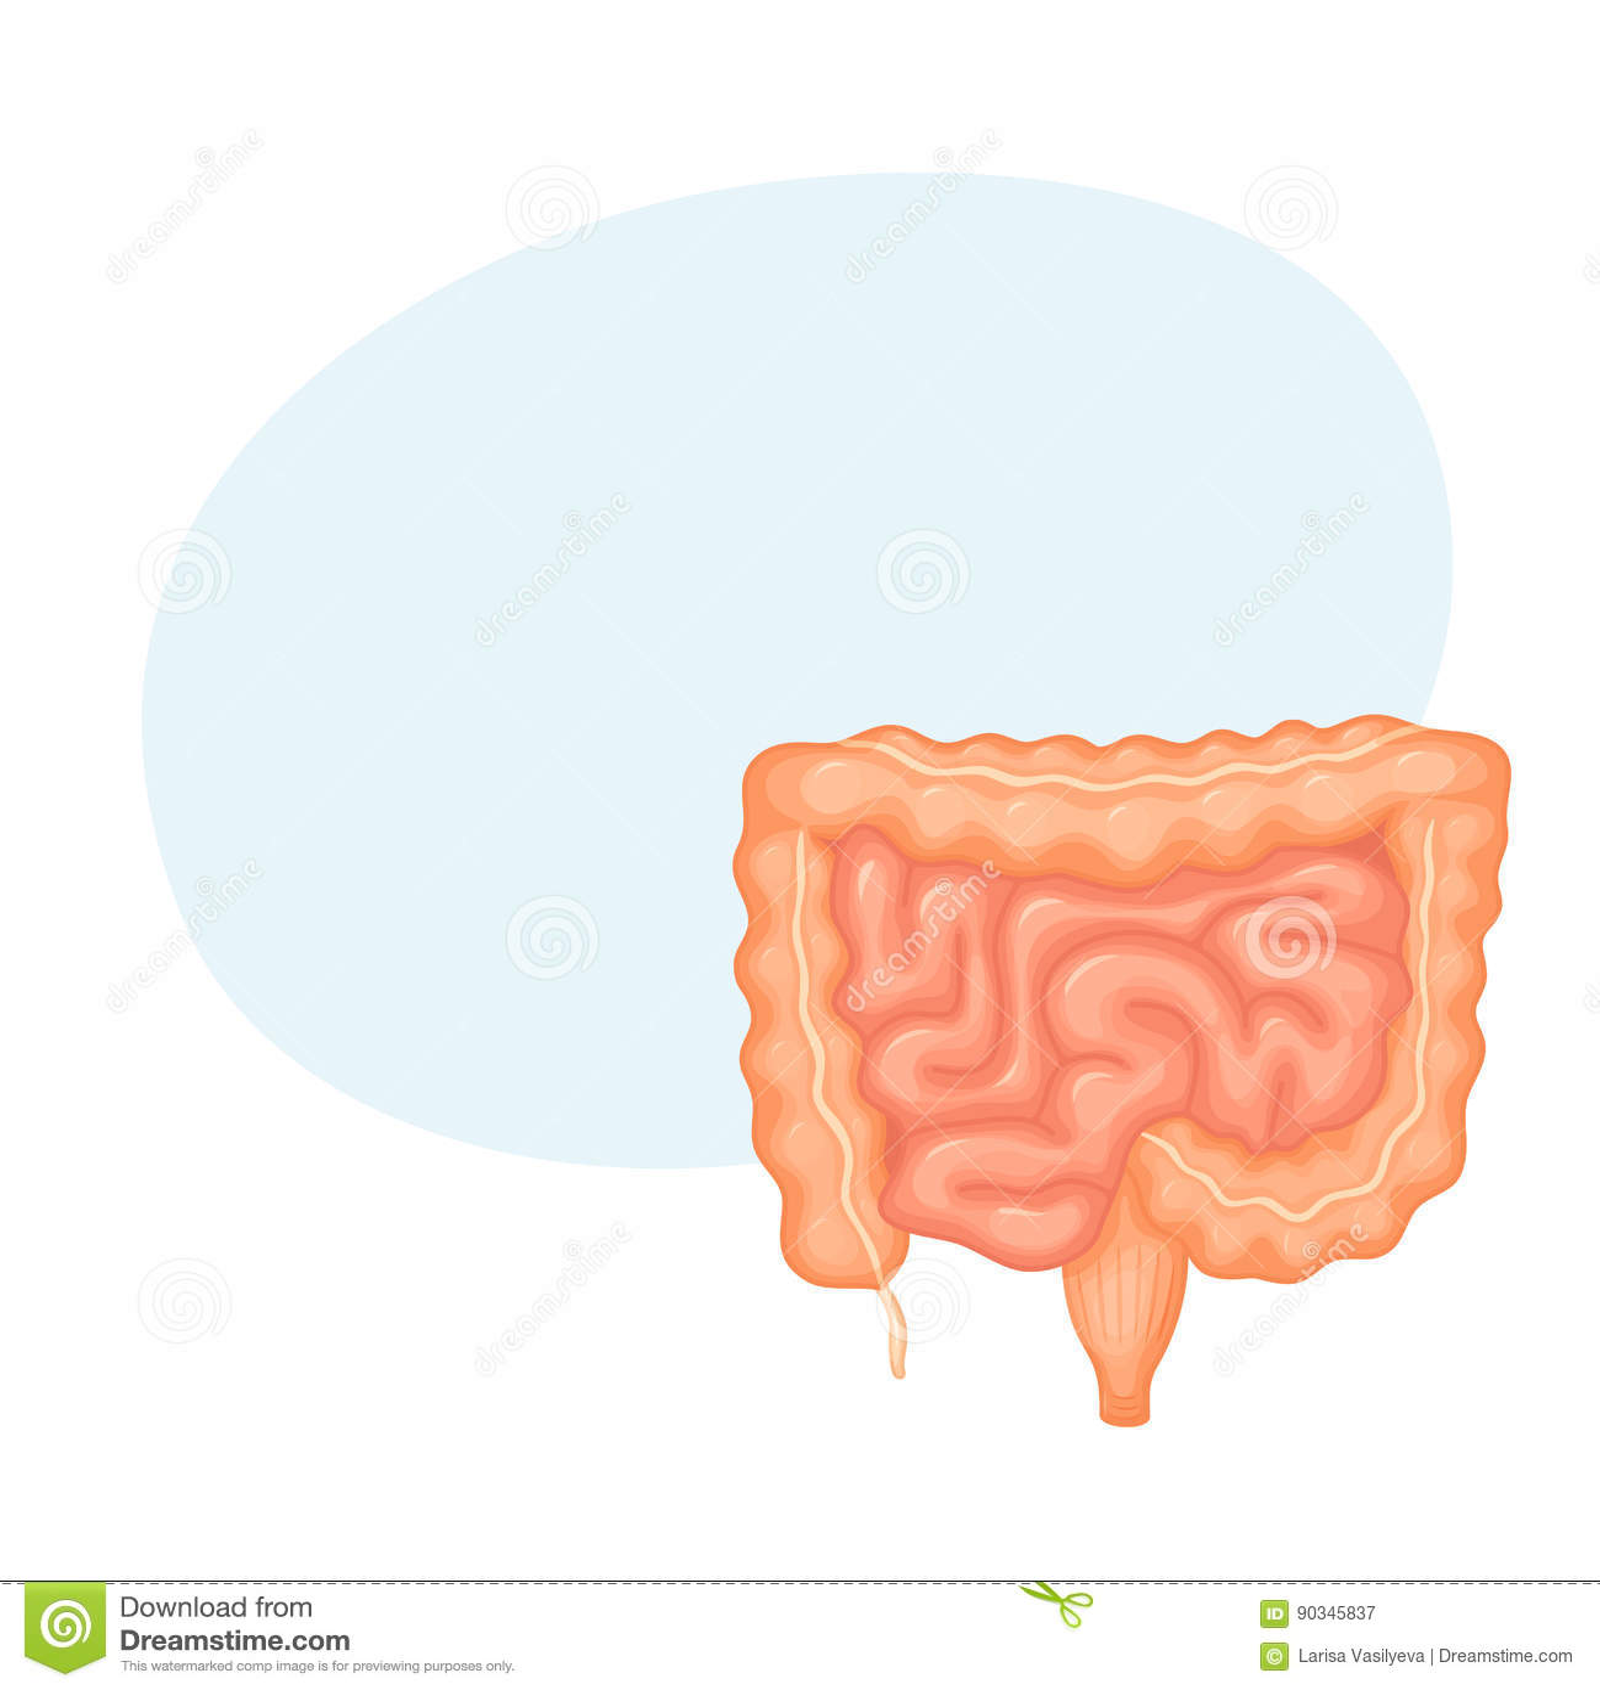 Human Intestines Anatomy Stock Vector Illustration Of Abdomen